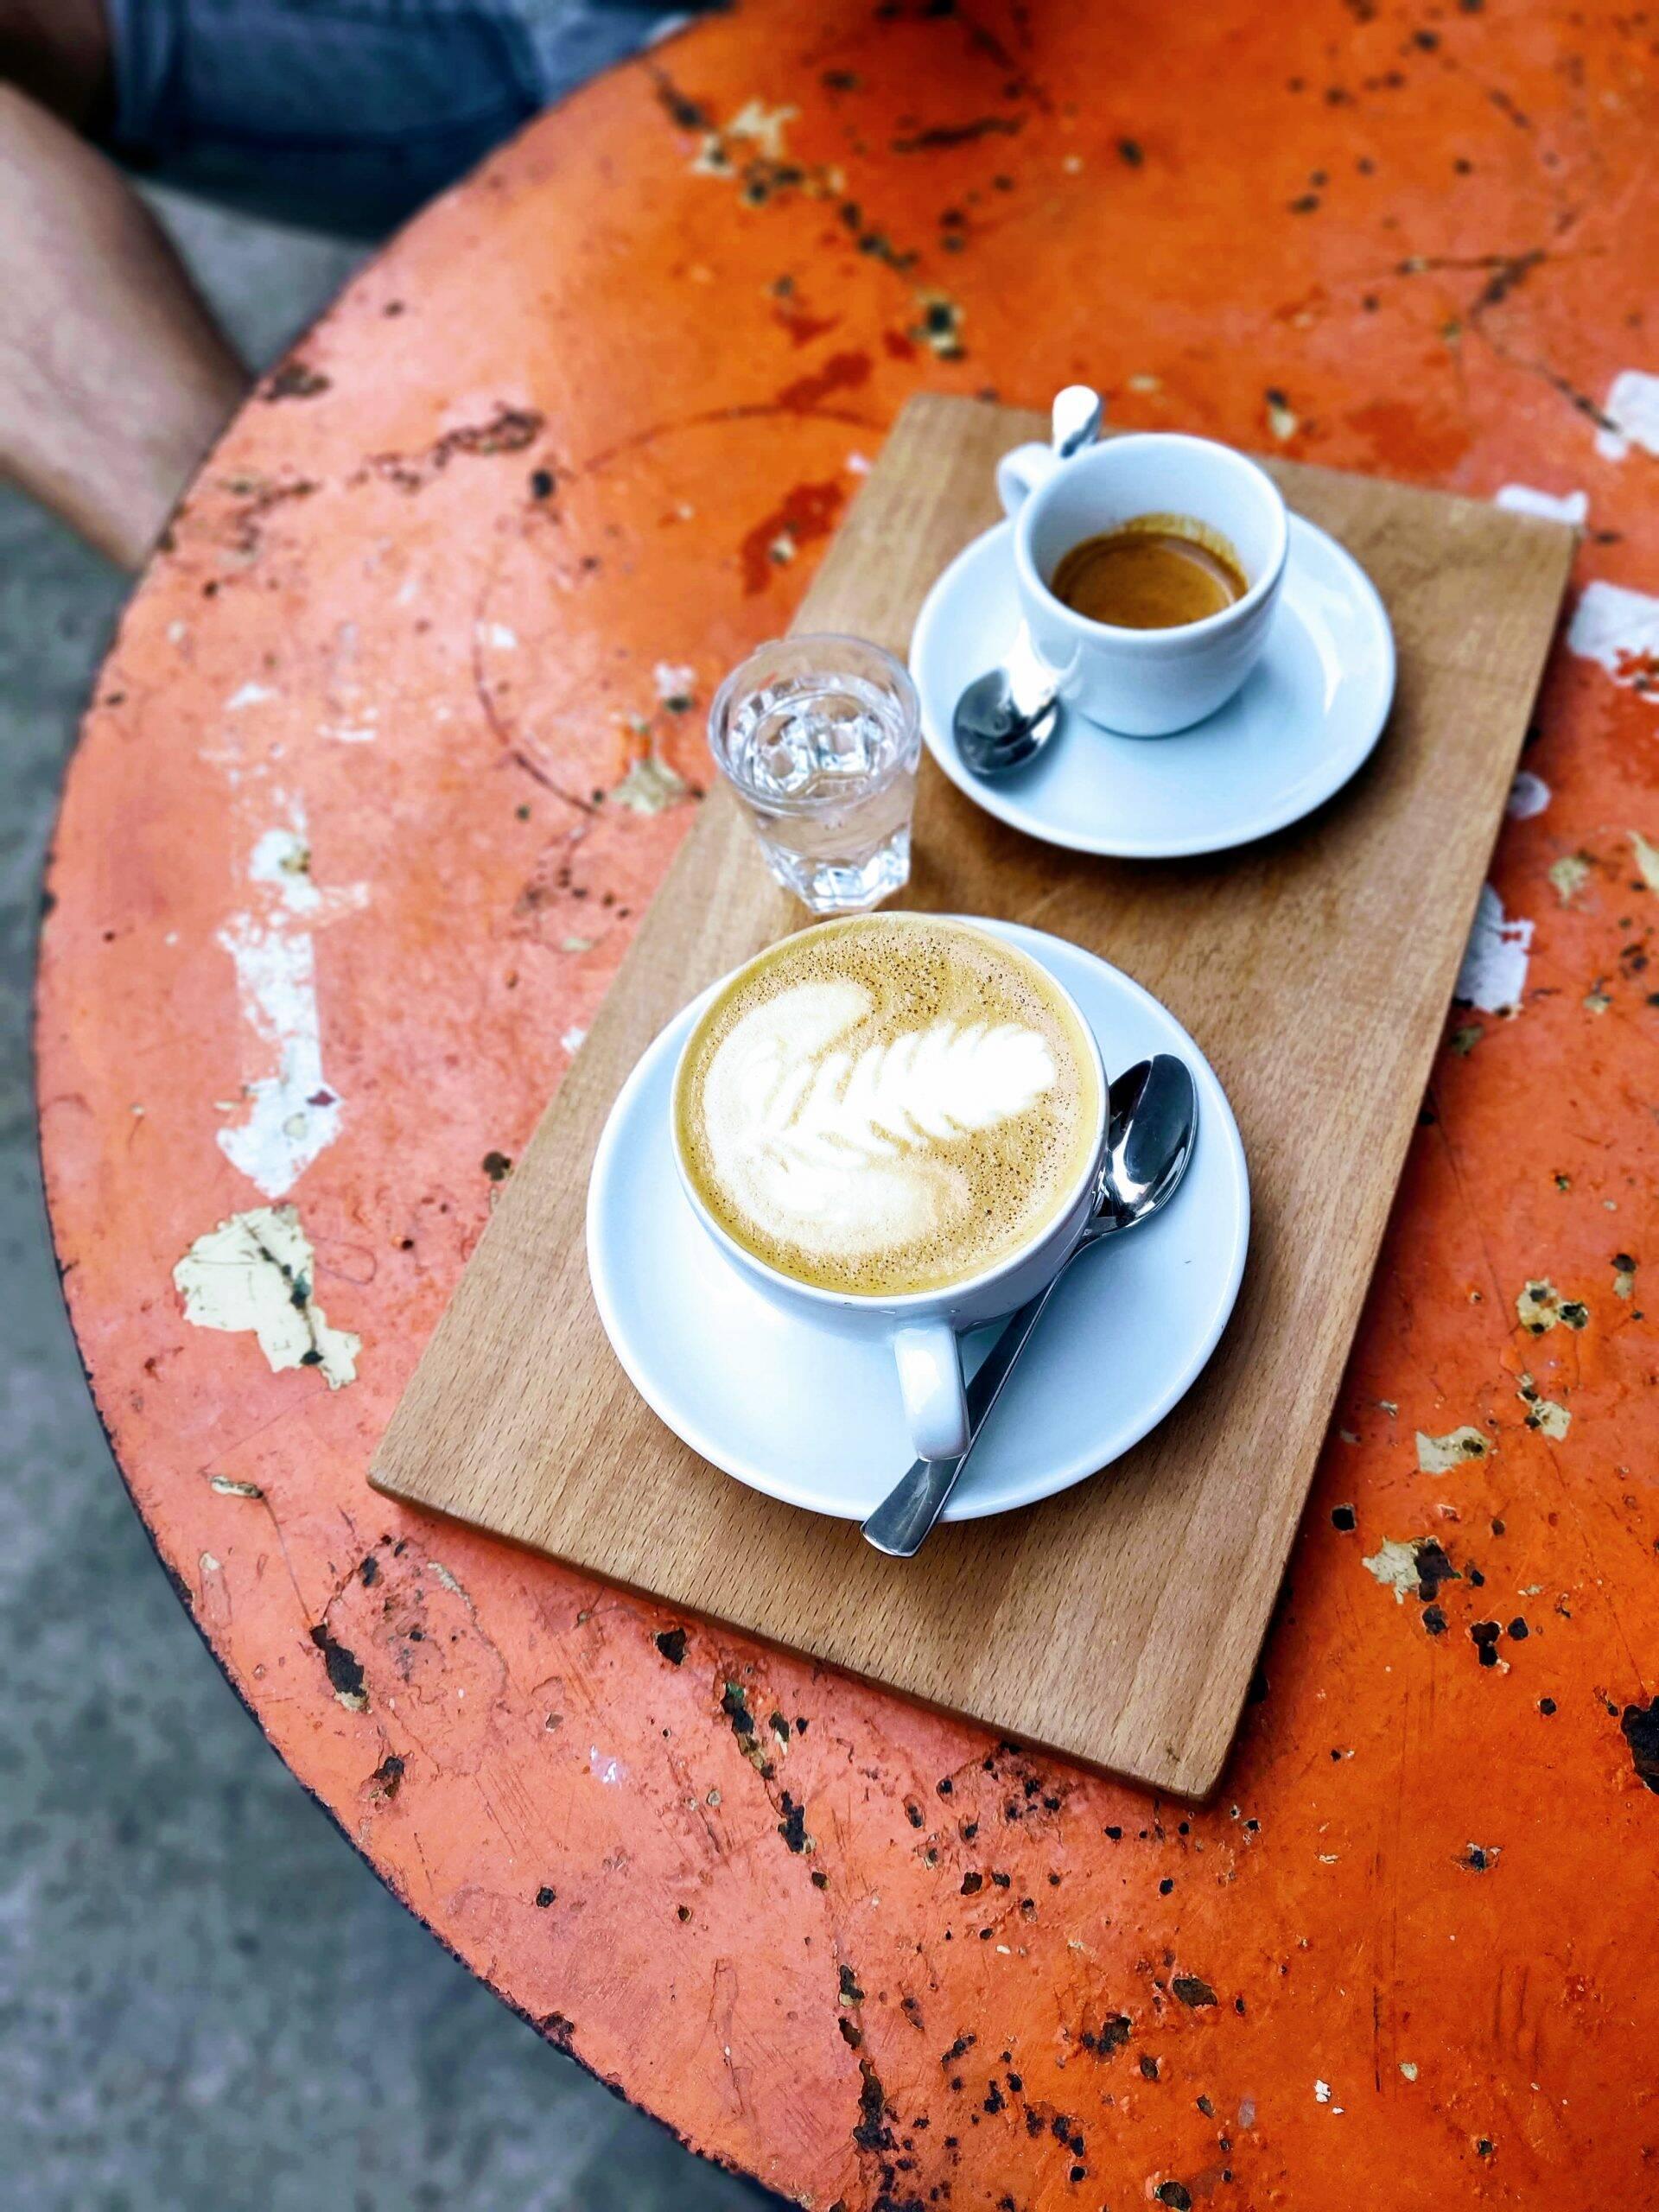 Belga & Co Coffee in Brussel